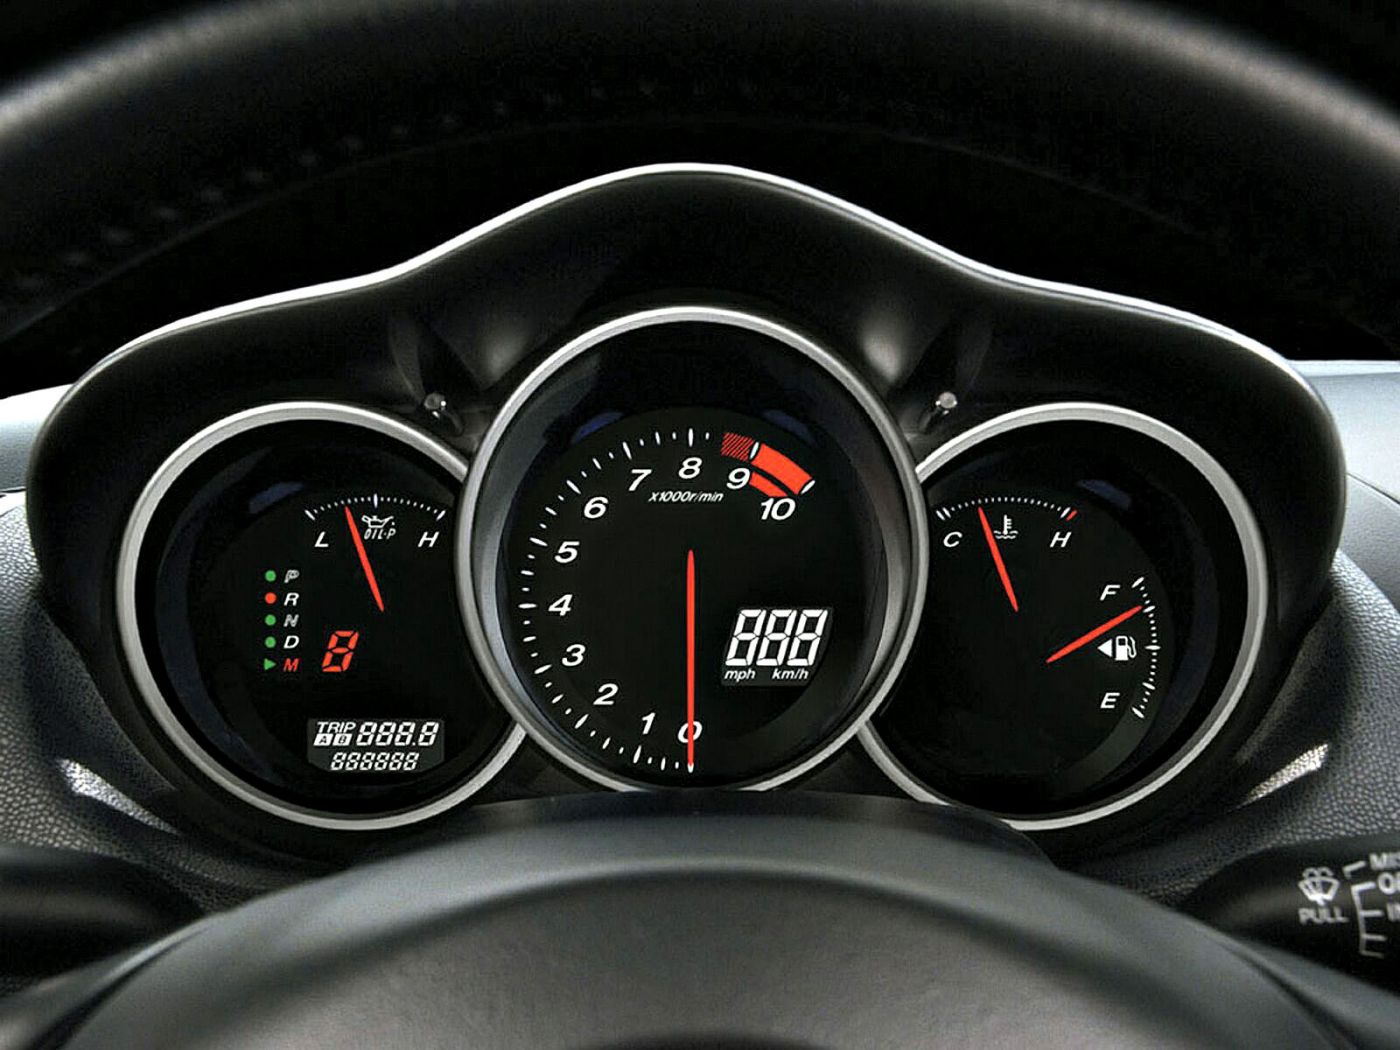 Mazda Rx8 Gauges Wallpaper 1400x1050